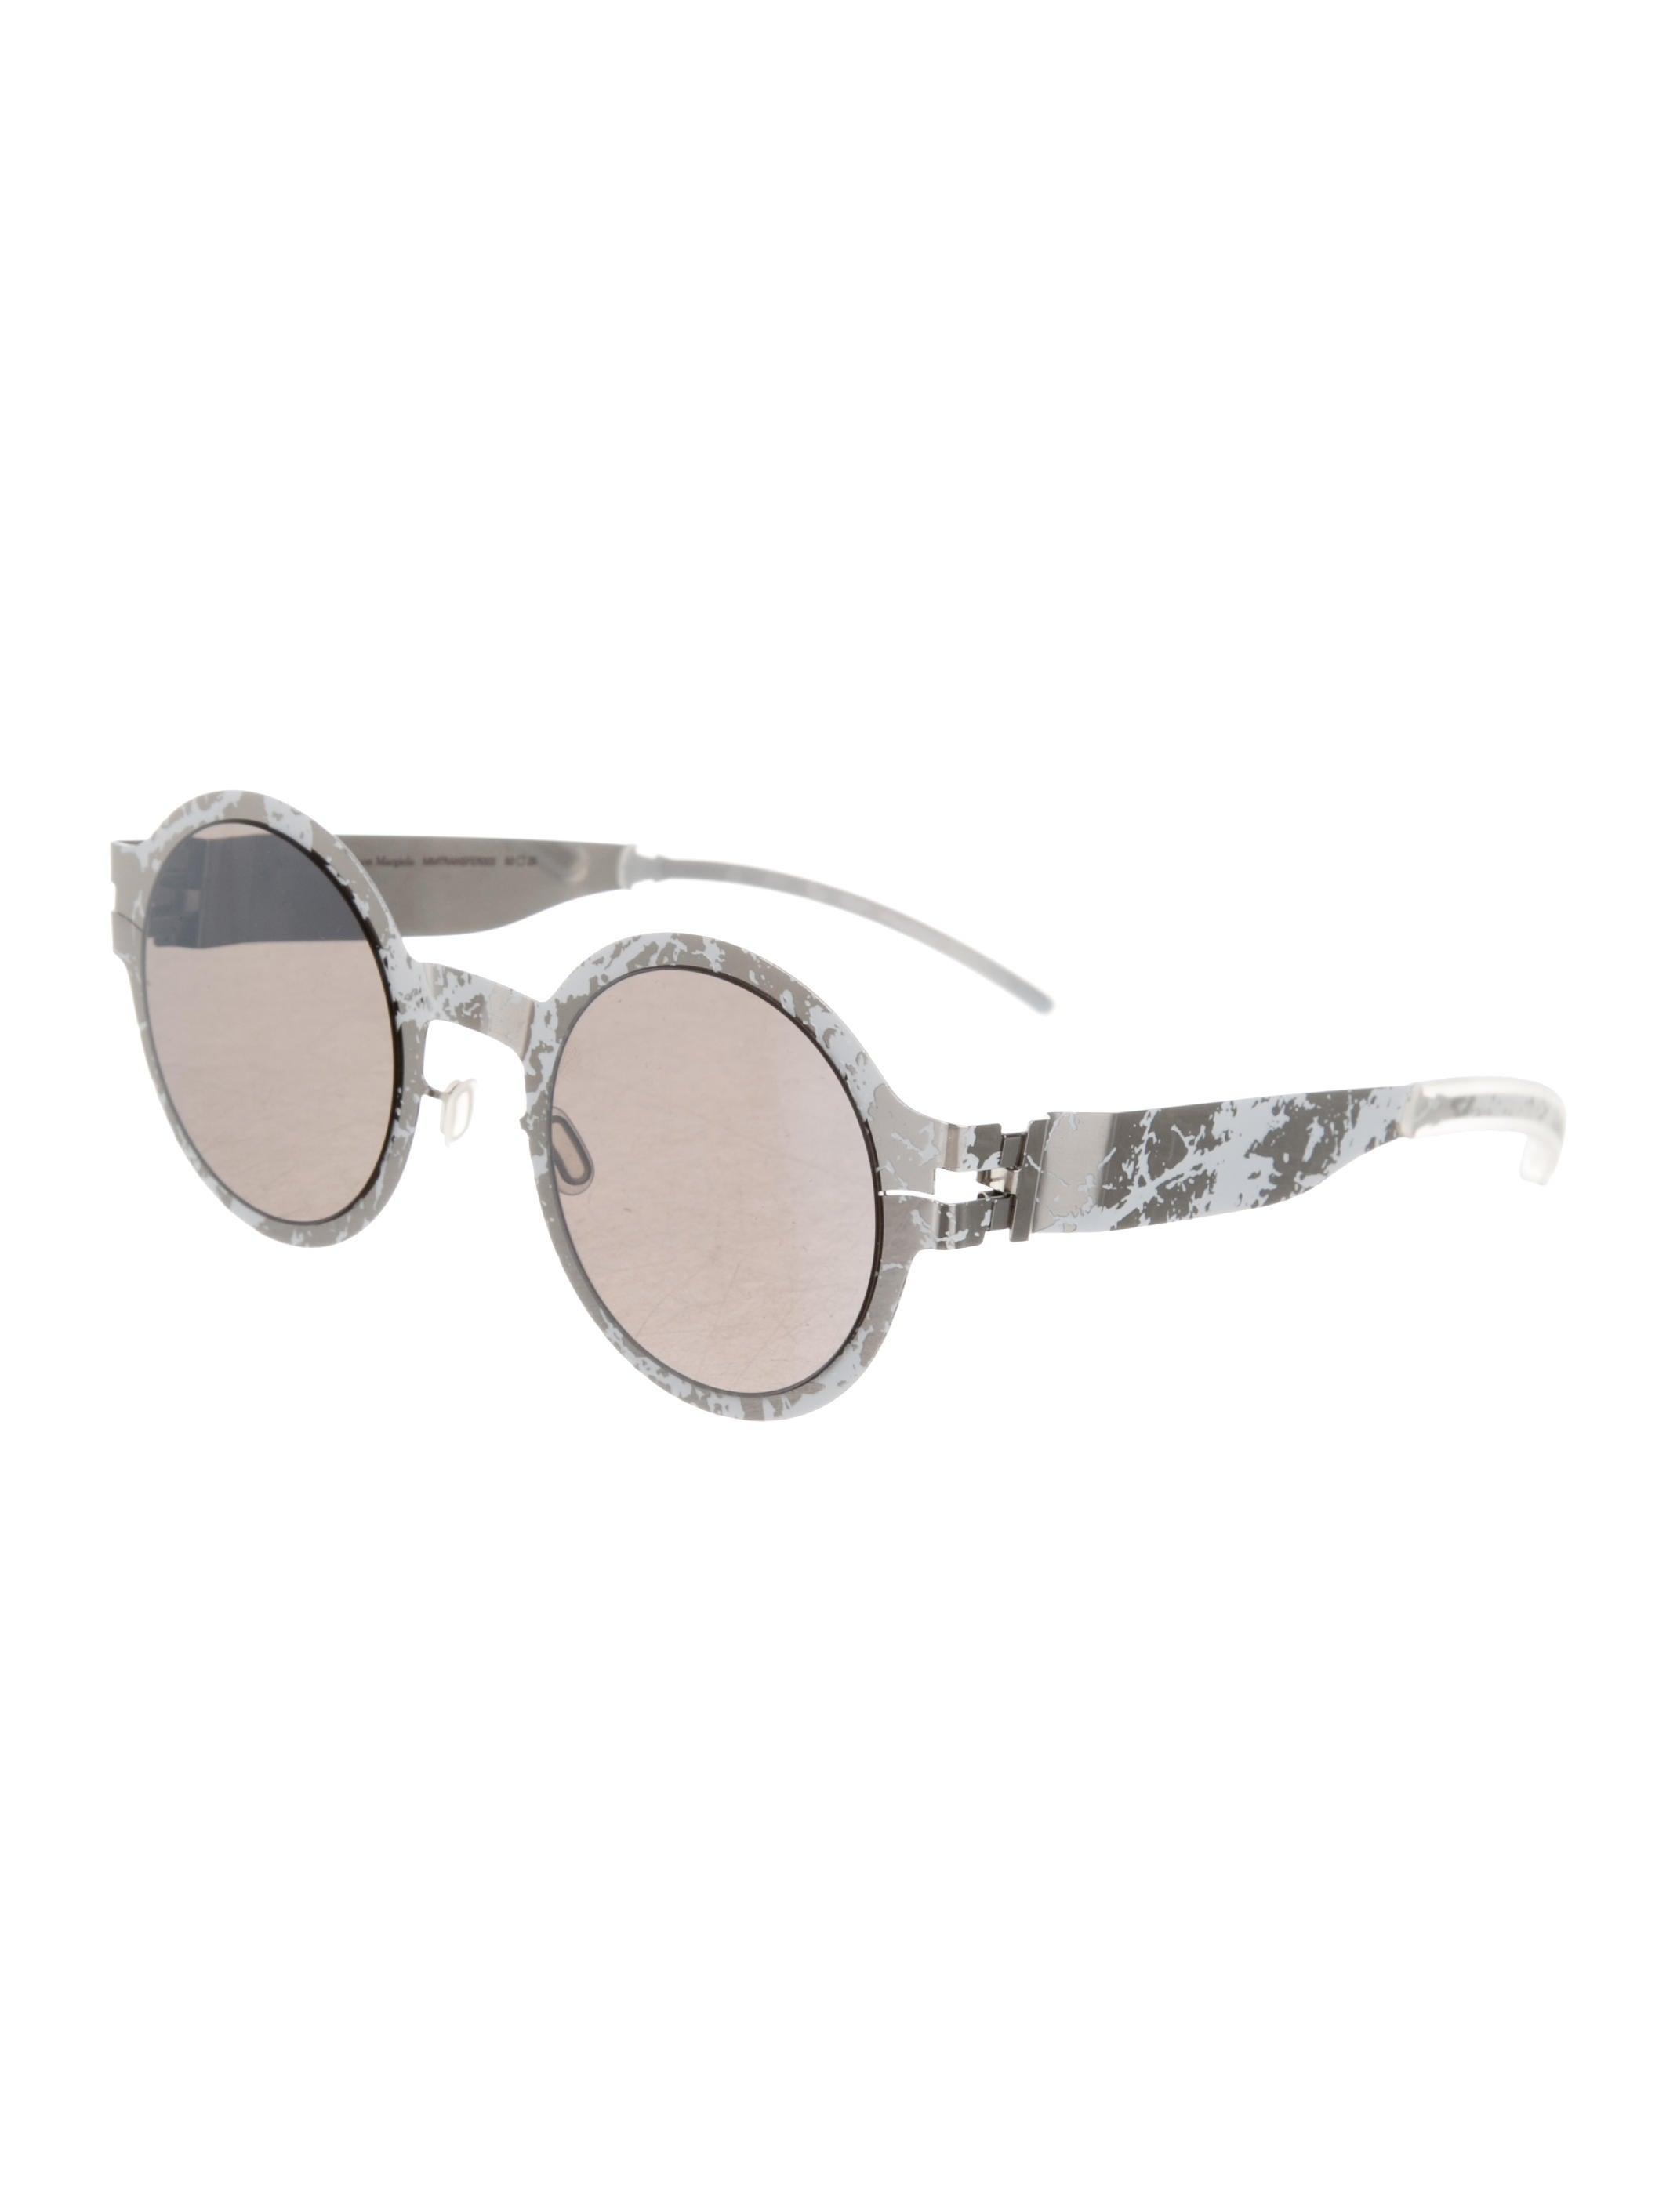 Mykita maison martin margiela 2016 transfer sunglasses for Martin margiela glasses